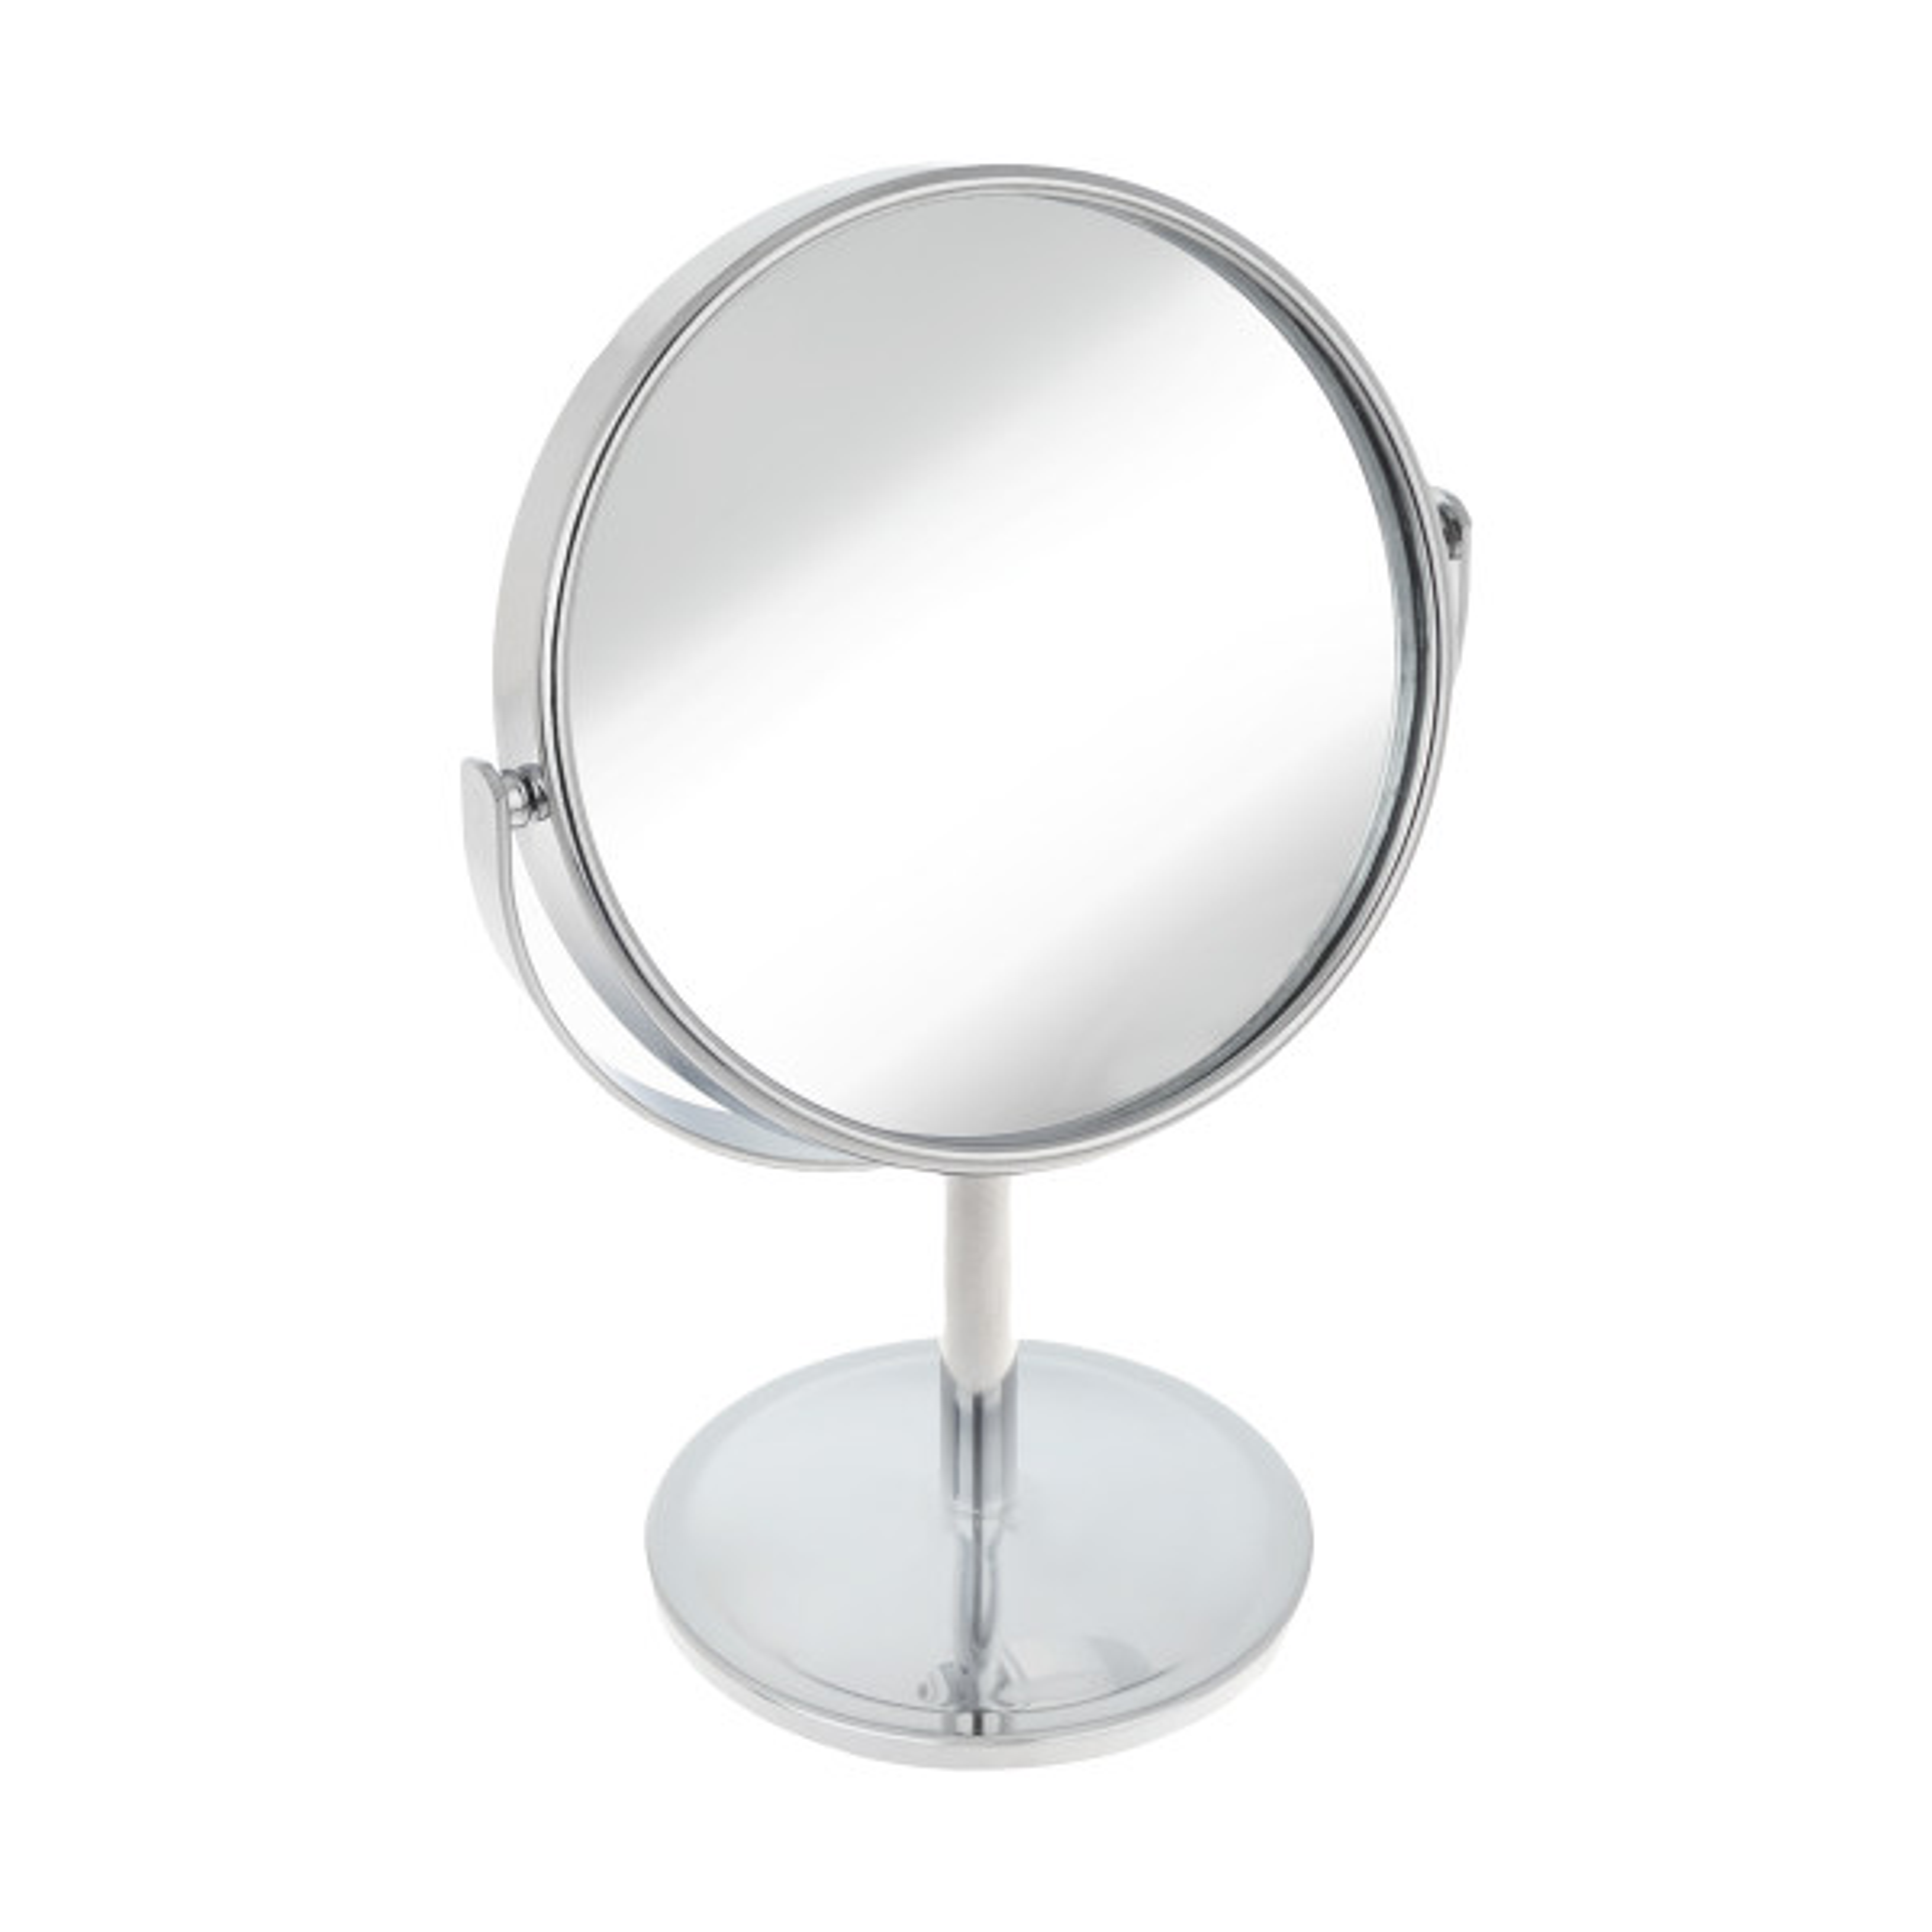 آینه آرایشی کد 81001